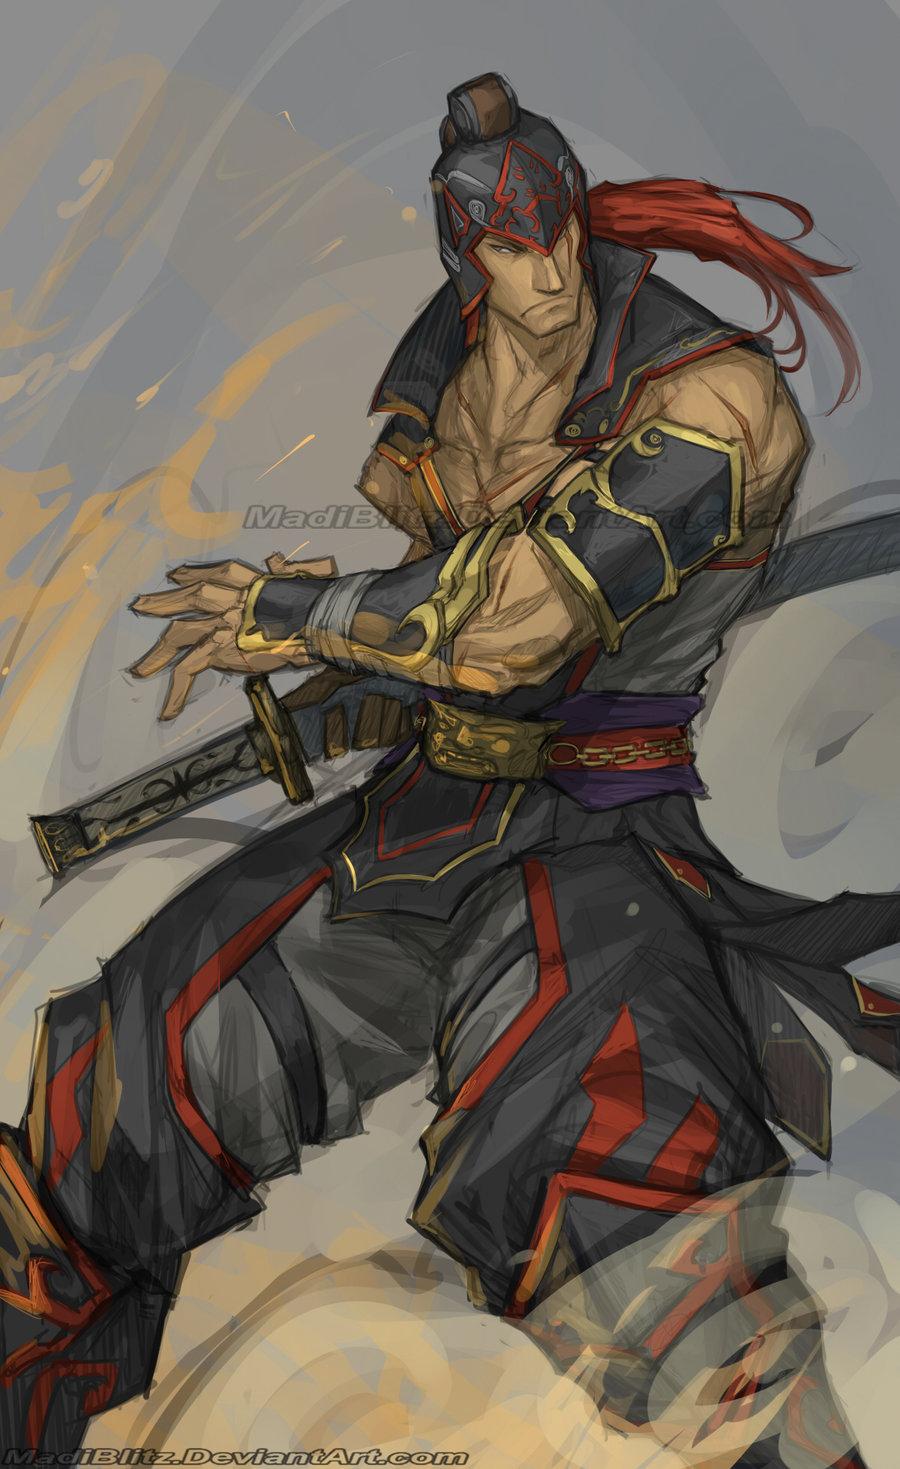 Drawn warrior zhou dynasty Tai MadiBlitz by Warriors DeviantArt